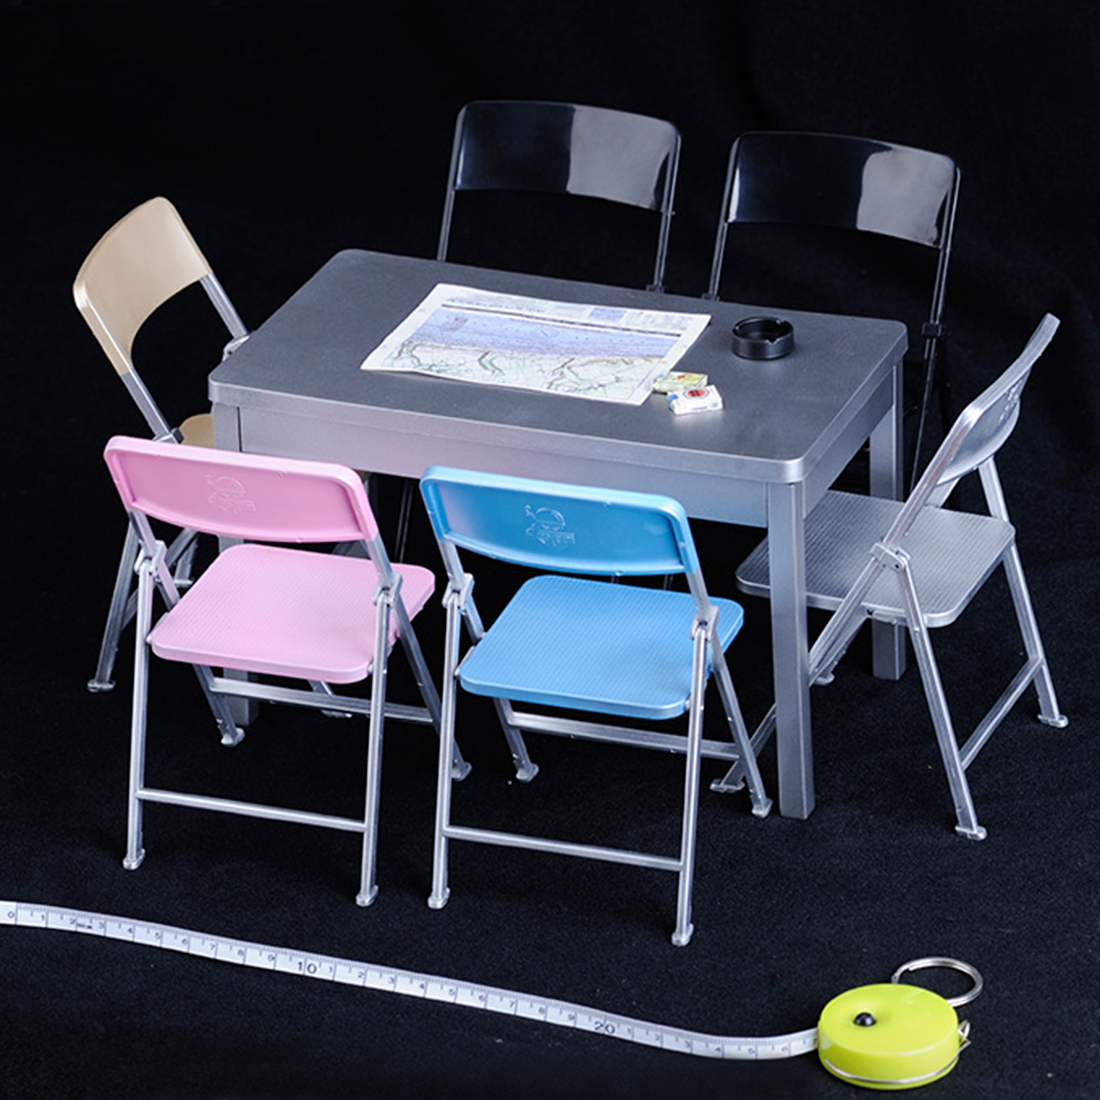 1//6 Scale Model Wooden Table DIY Desk Model Furniture Accessories 2 Color